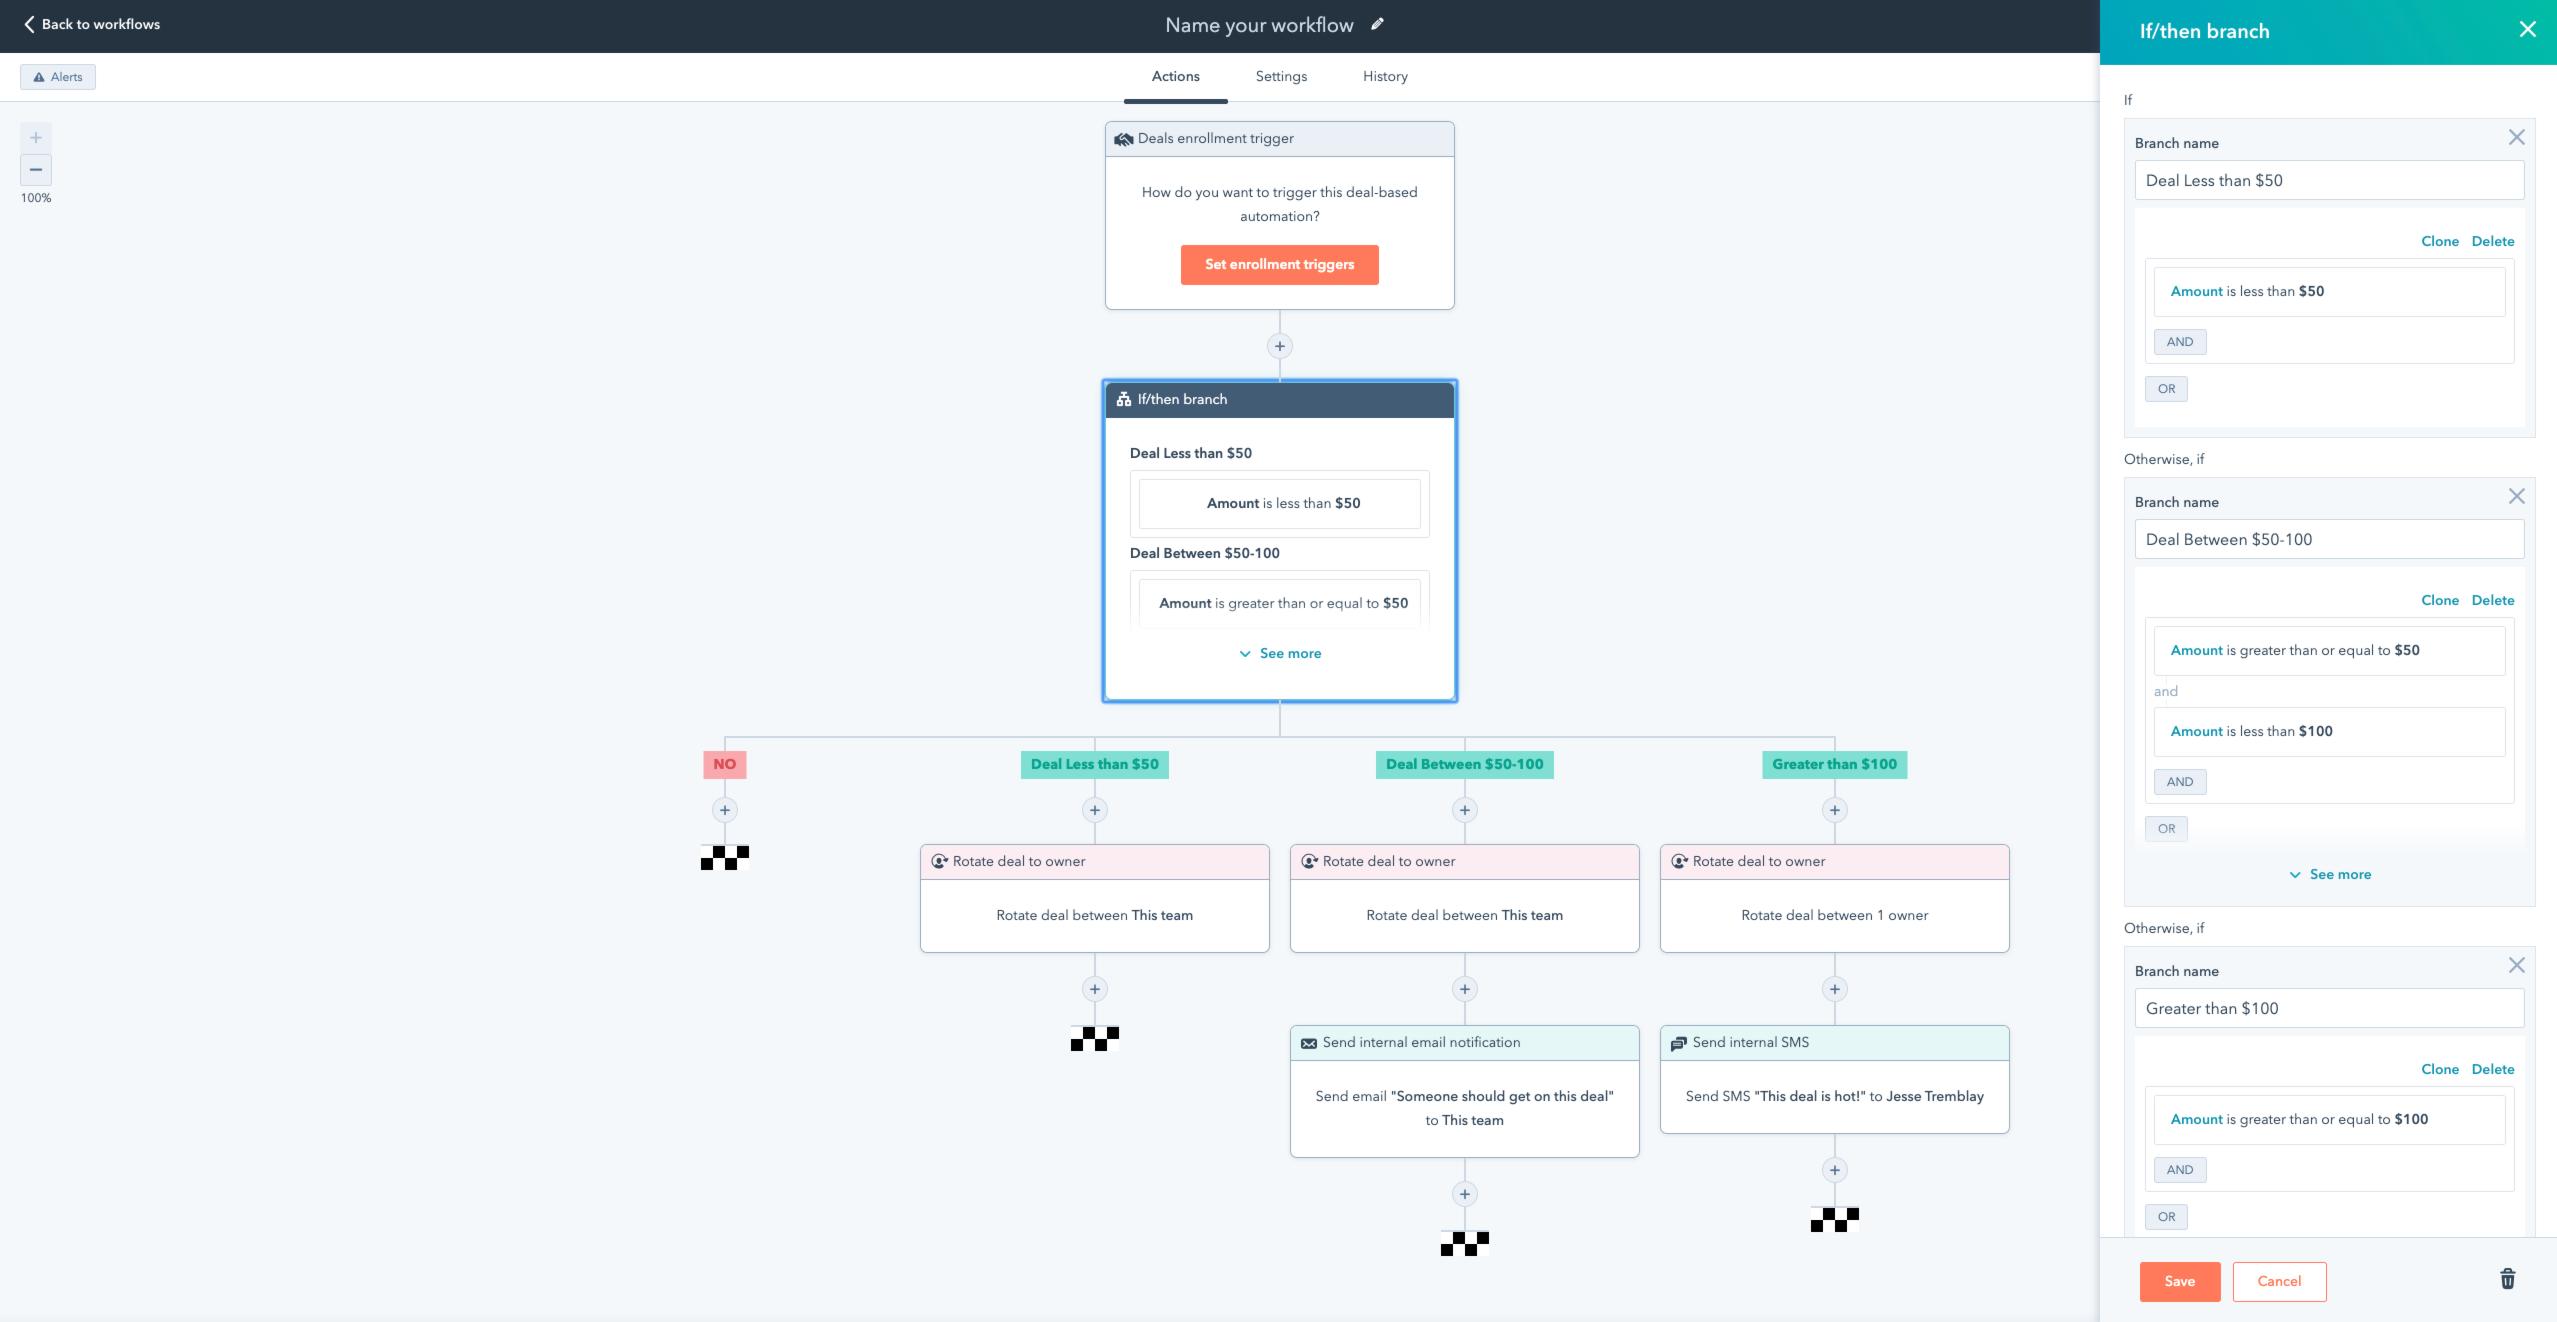 Workflow Branch_Hubspot Product Updates